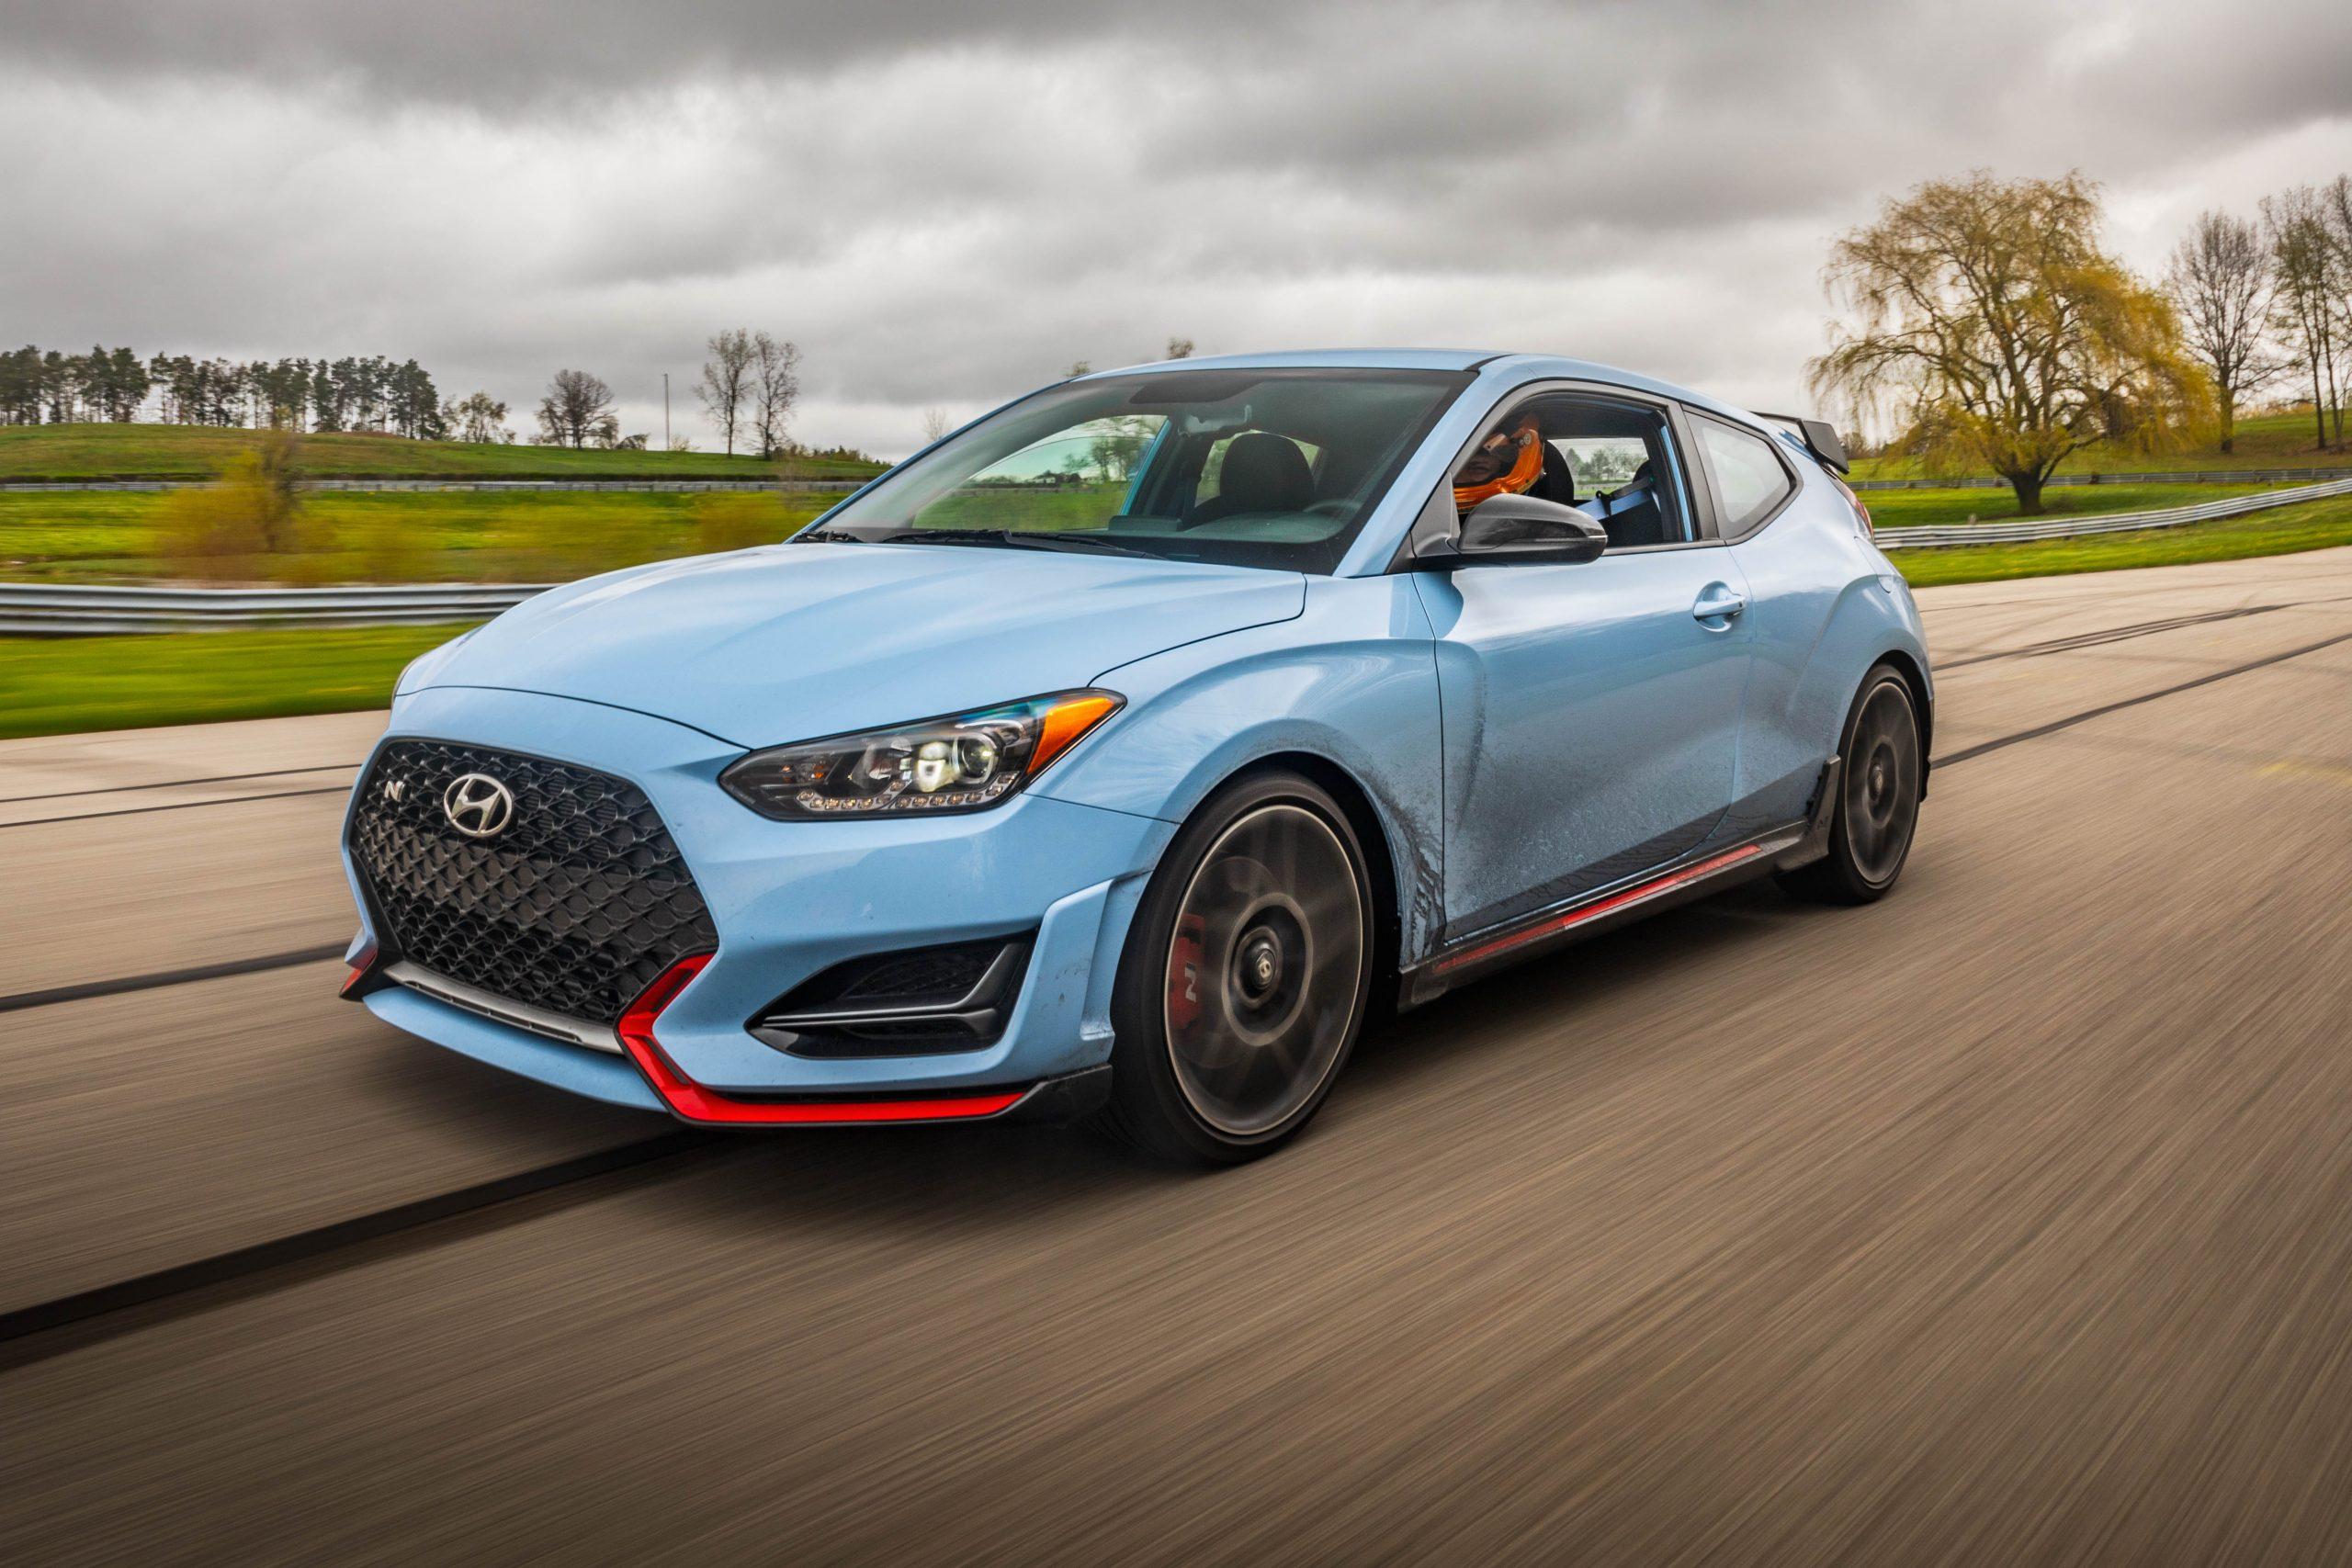 2020 Hyundai Veloster N track front three quarter